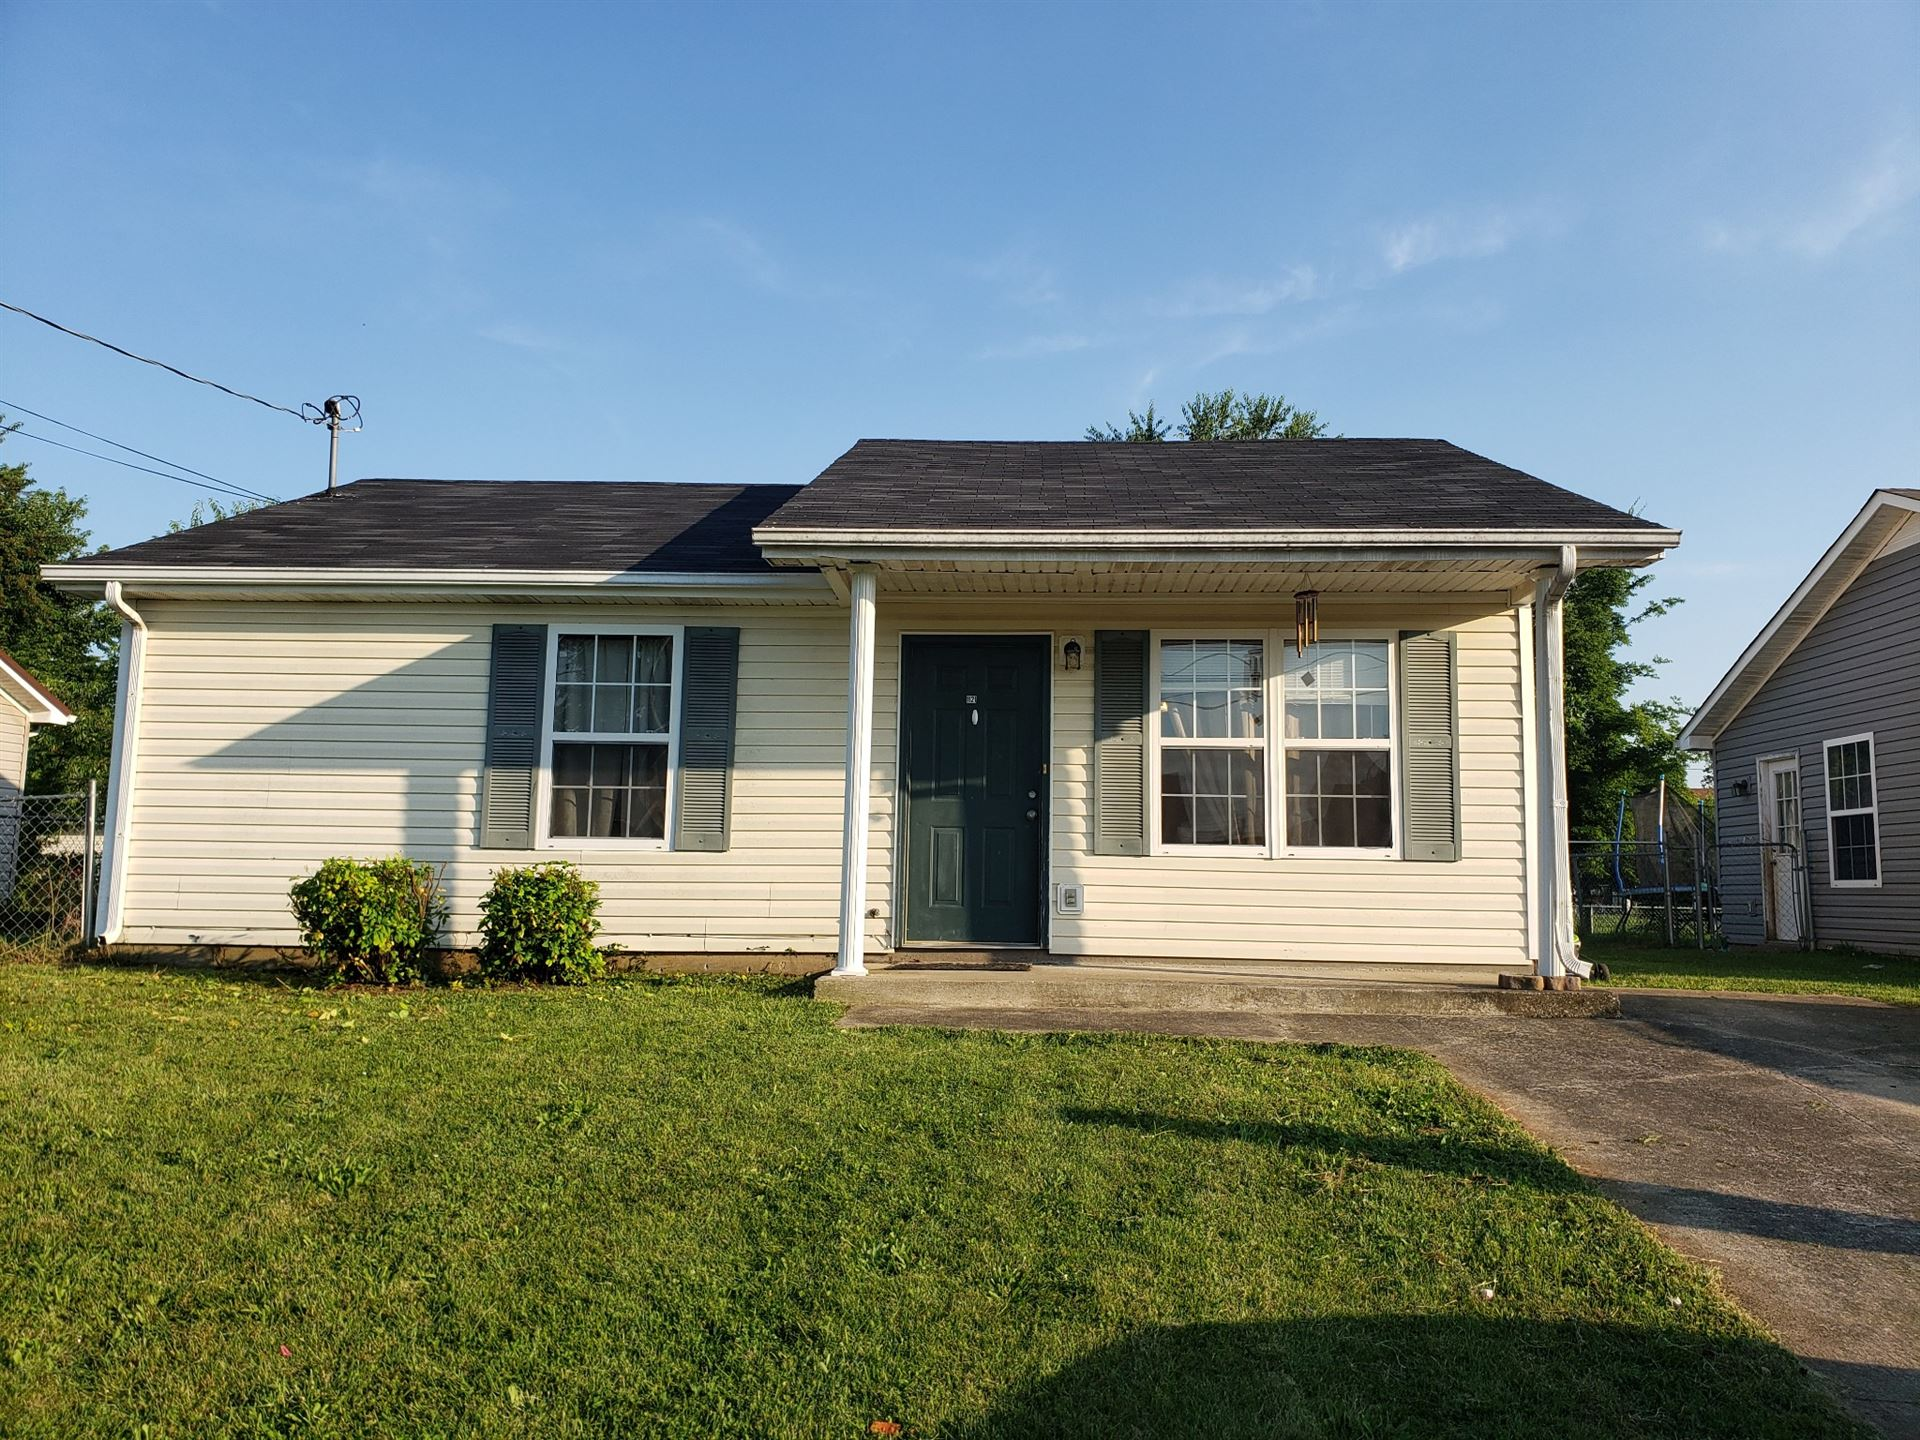 1121 Keith Ave, Oak Grove, KY 42262 - MLS#: 2263188